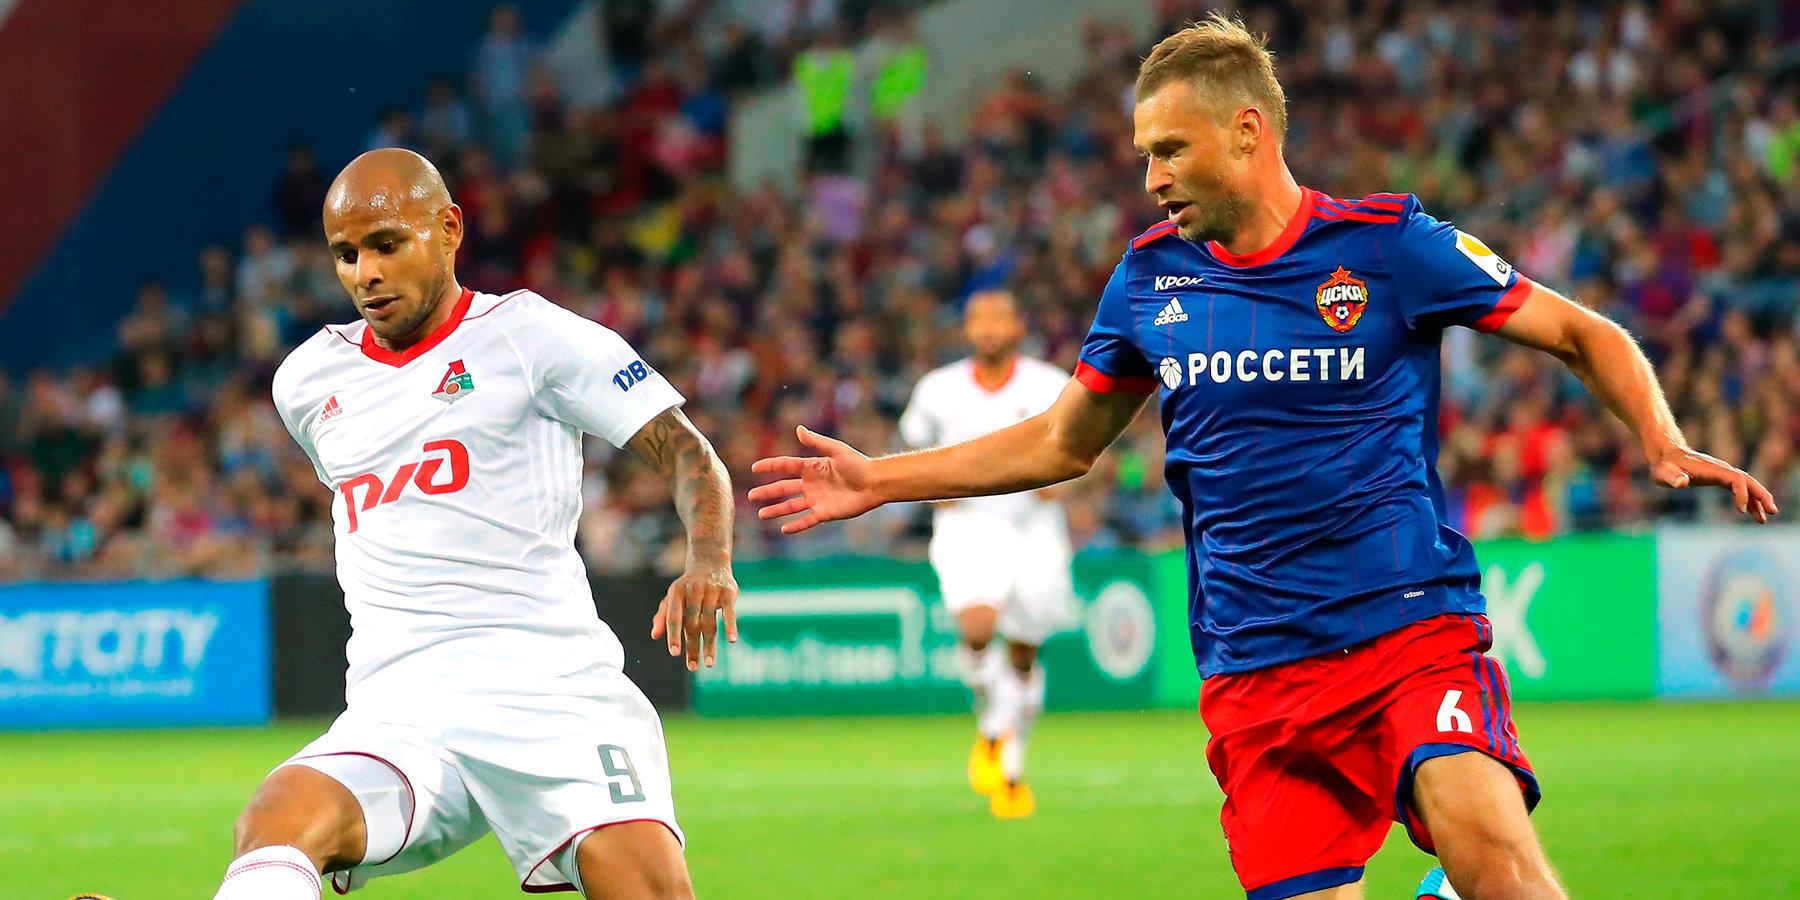 Футболист «Локомотива» Ари небыл прооперирован, операция будет позже